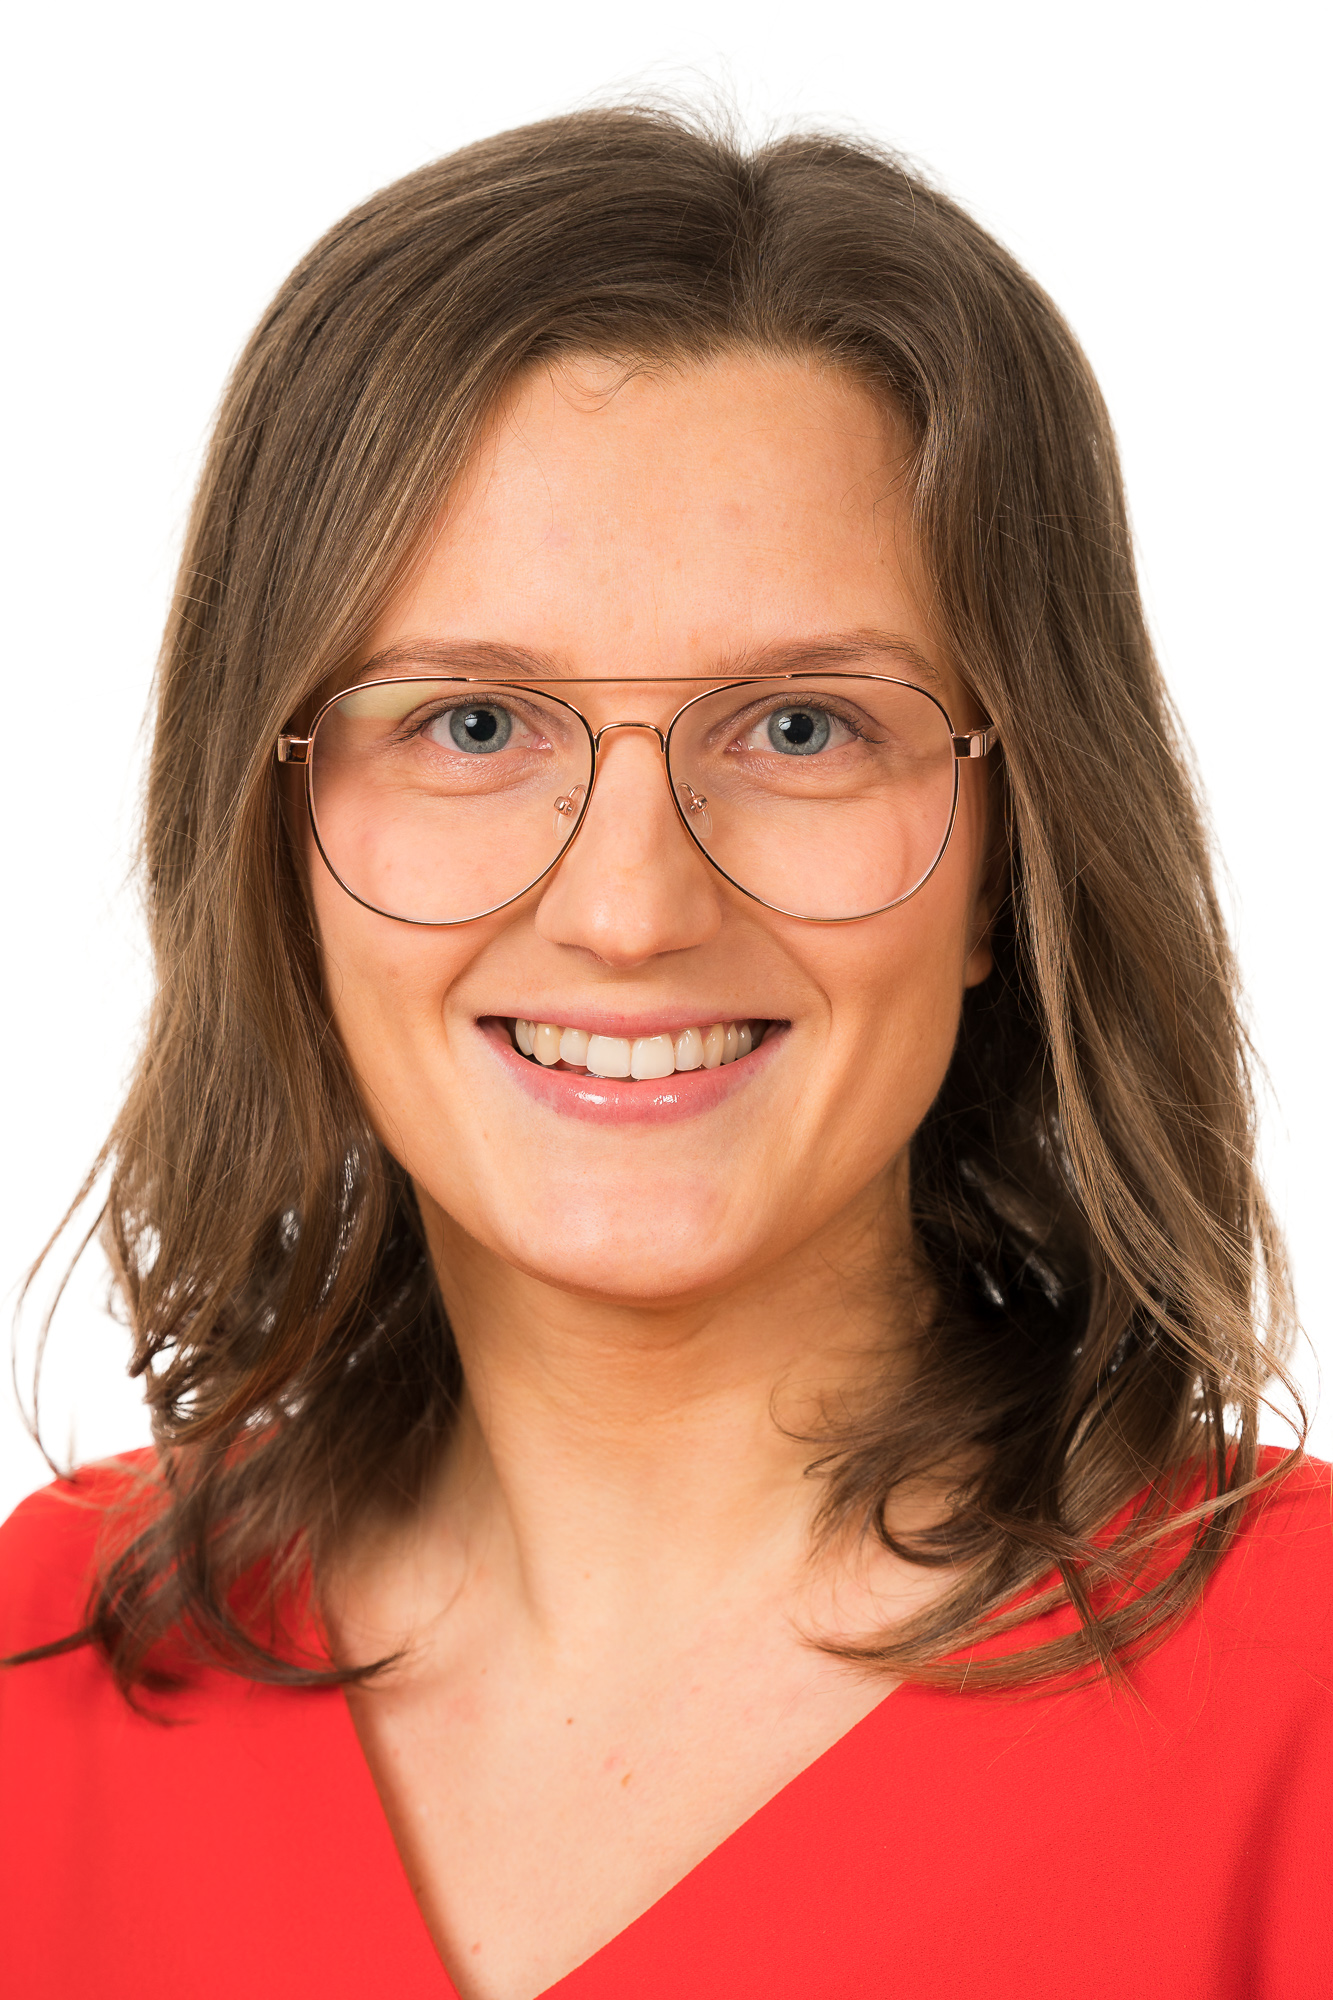 Laura Tolkkinen